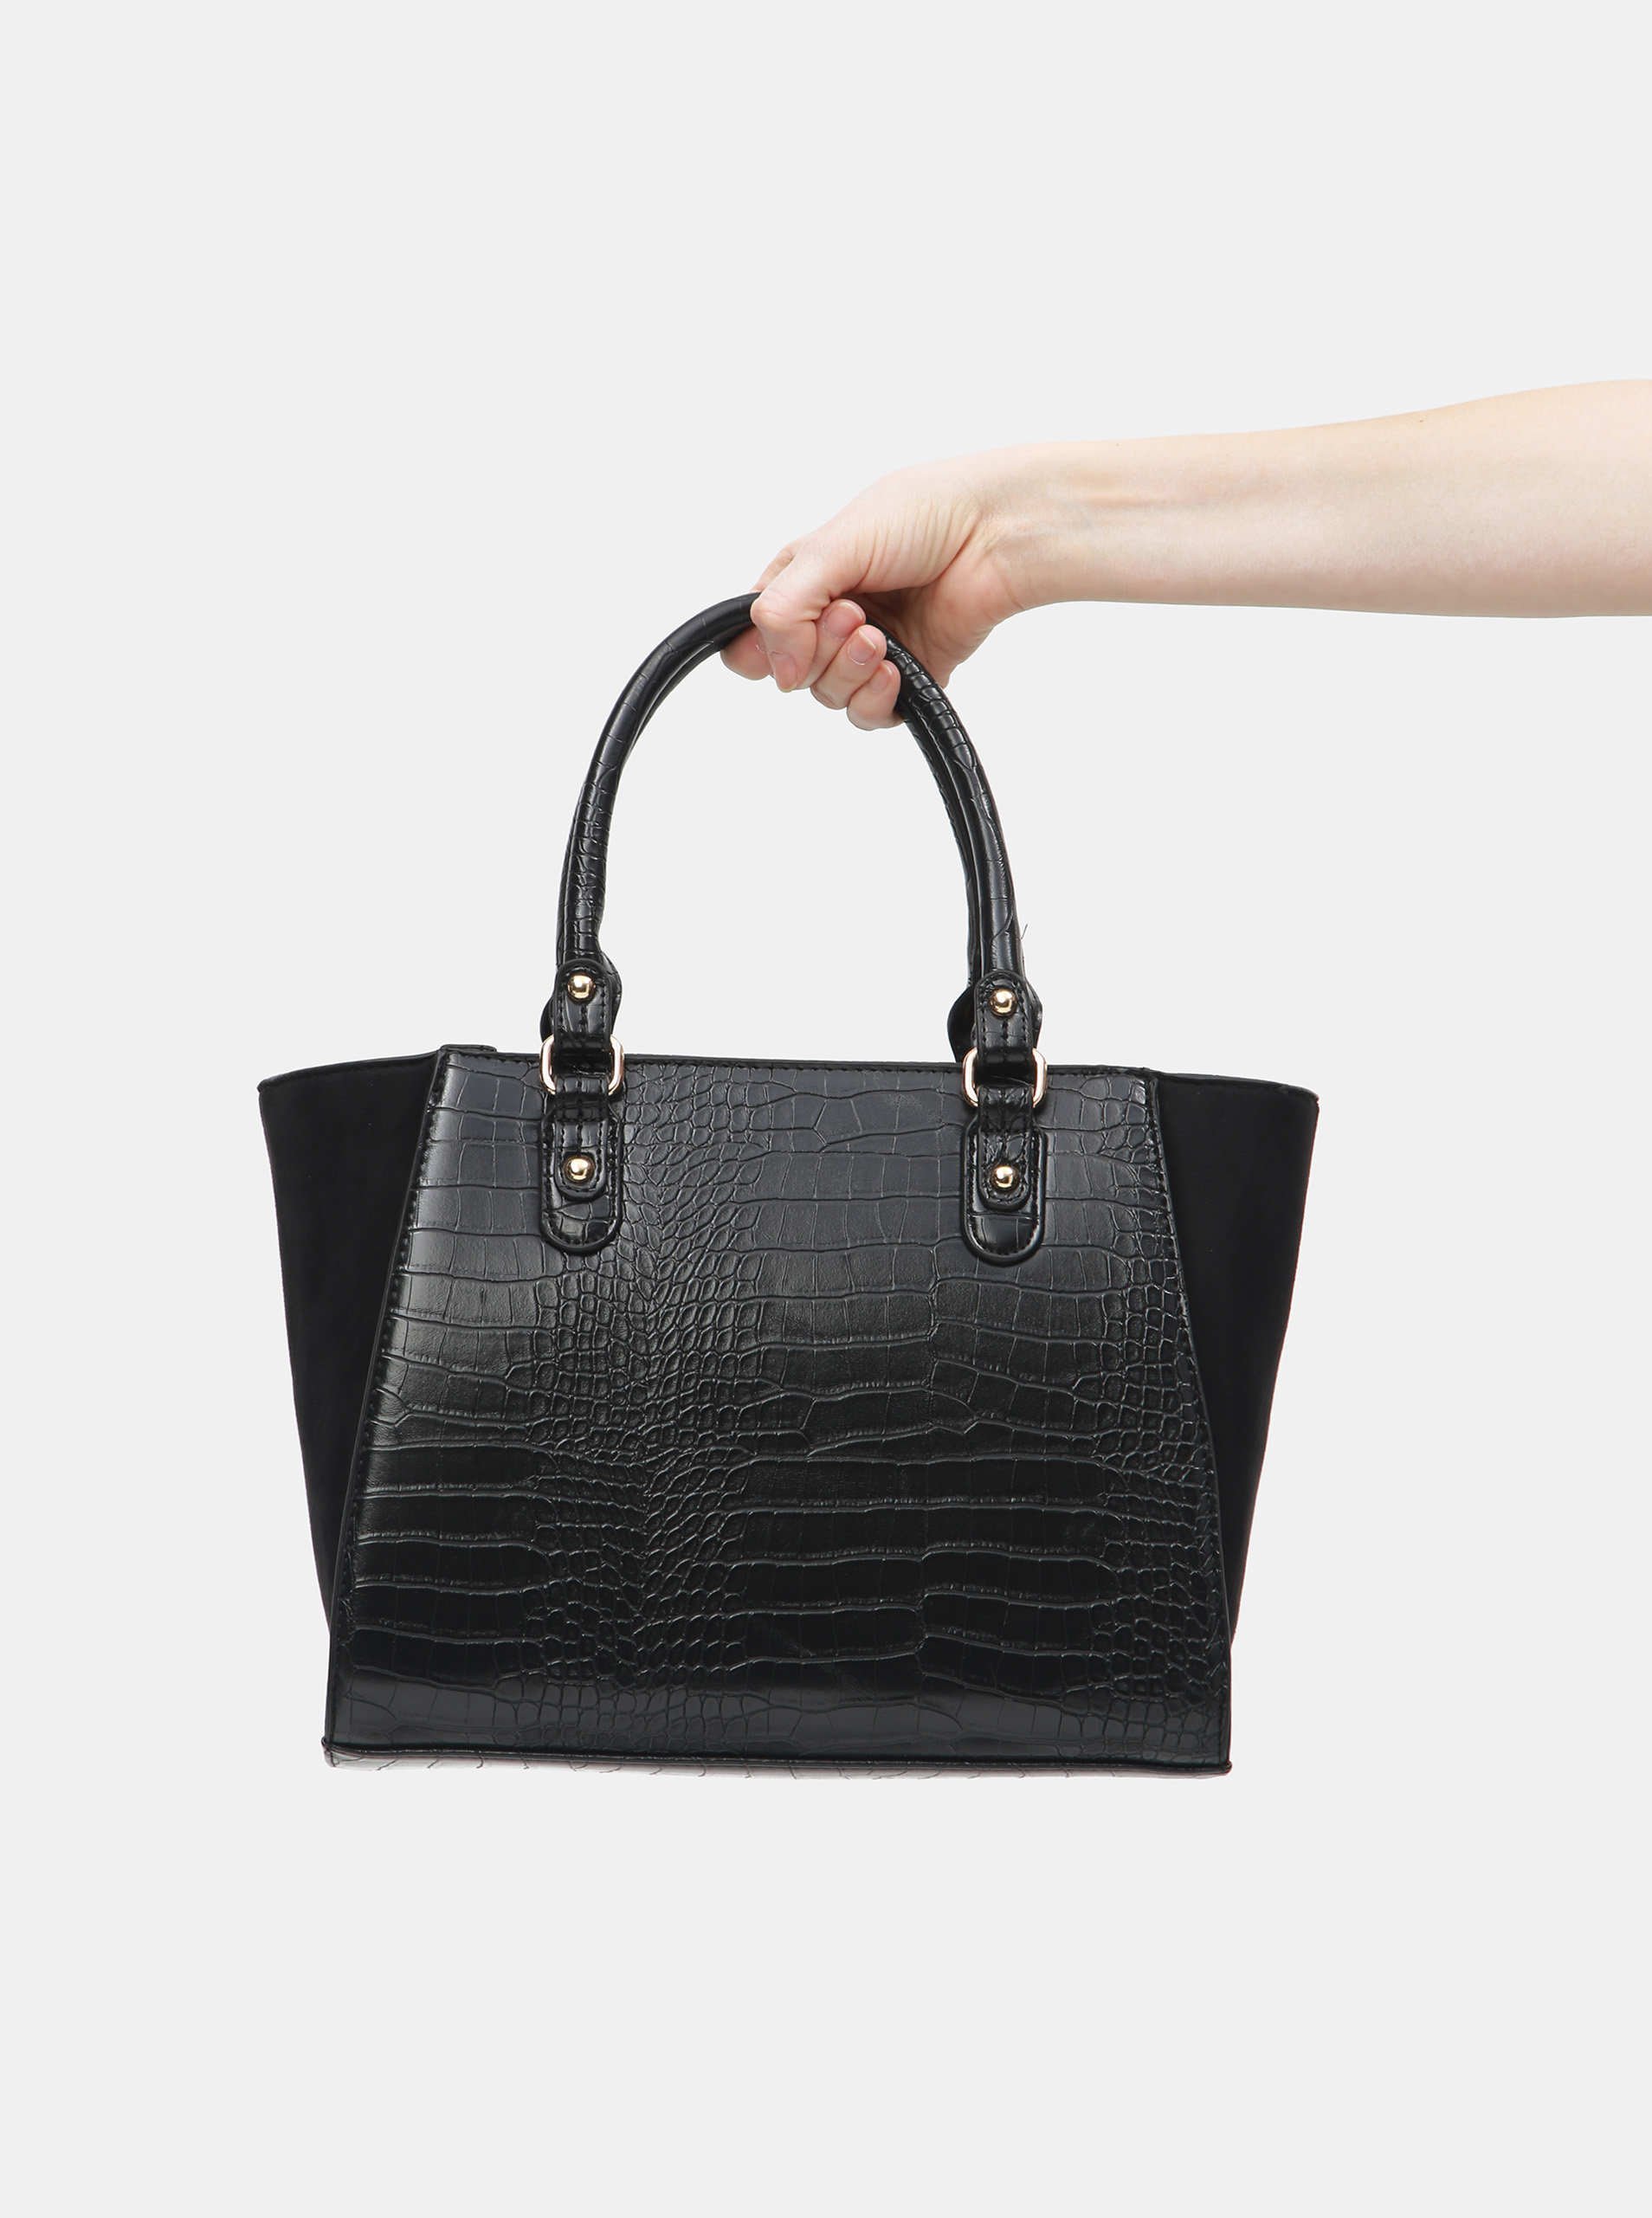 b9084b45b3 Černá kabelka s hadím vzorem Dorothy Perkins ...